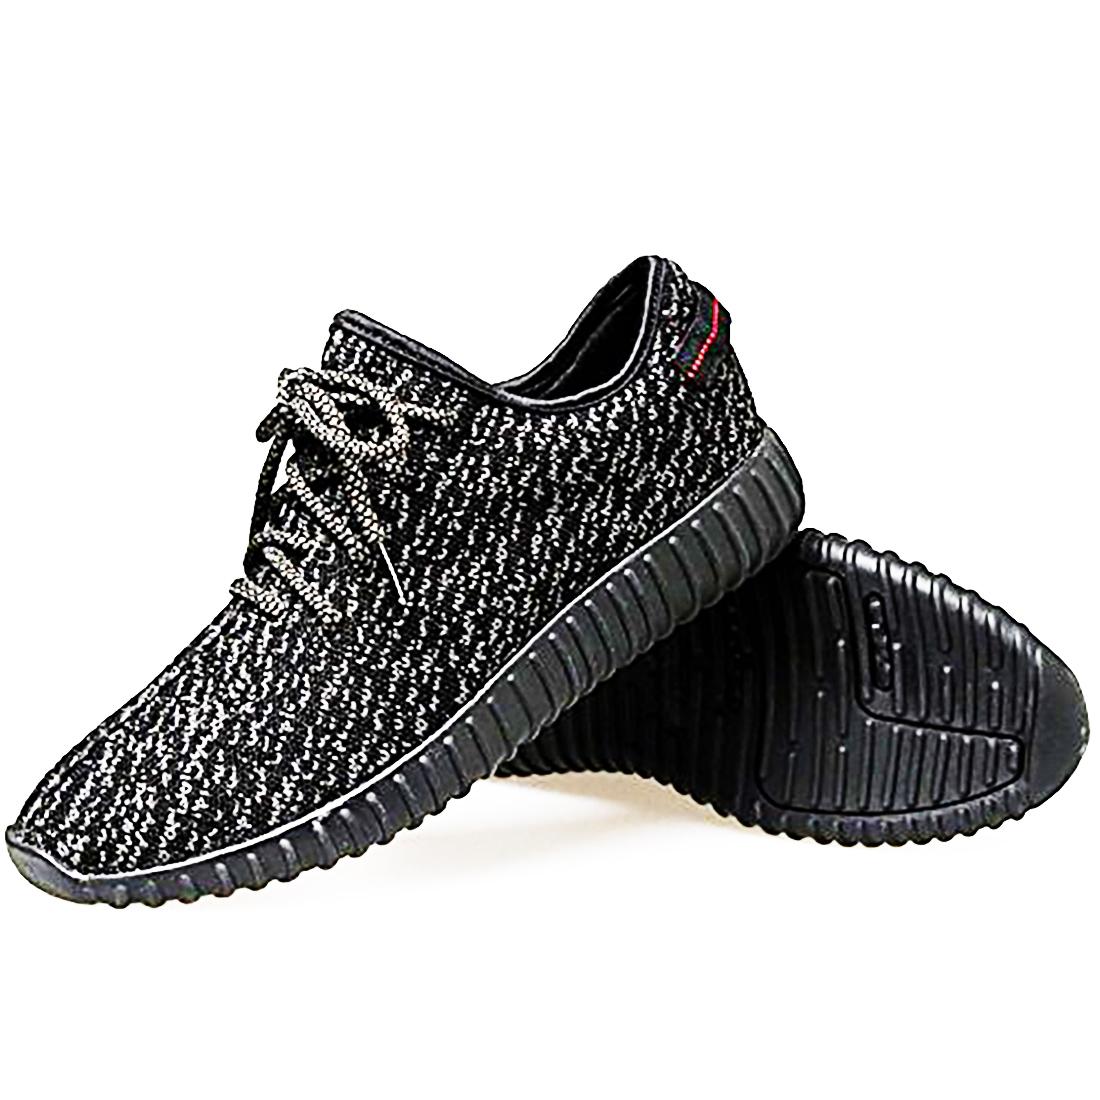 4a0c15edcb Men Women Unisex Lightweight Fashion Sneakers Breathable ...